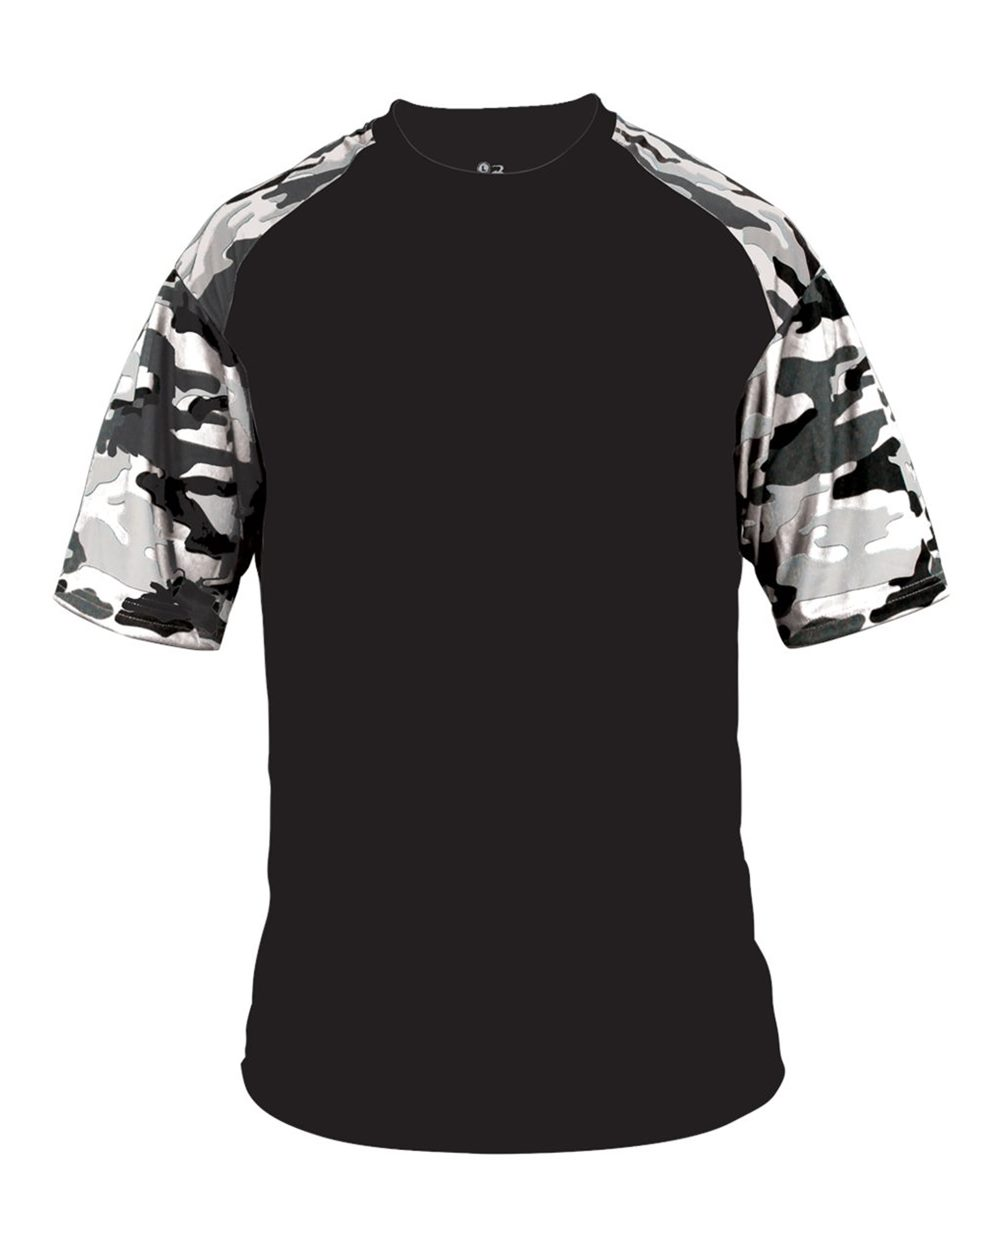 ed9dbfcf Badger Sportswear 4141 - blankstyle.com